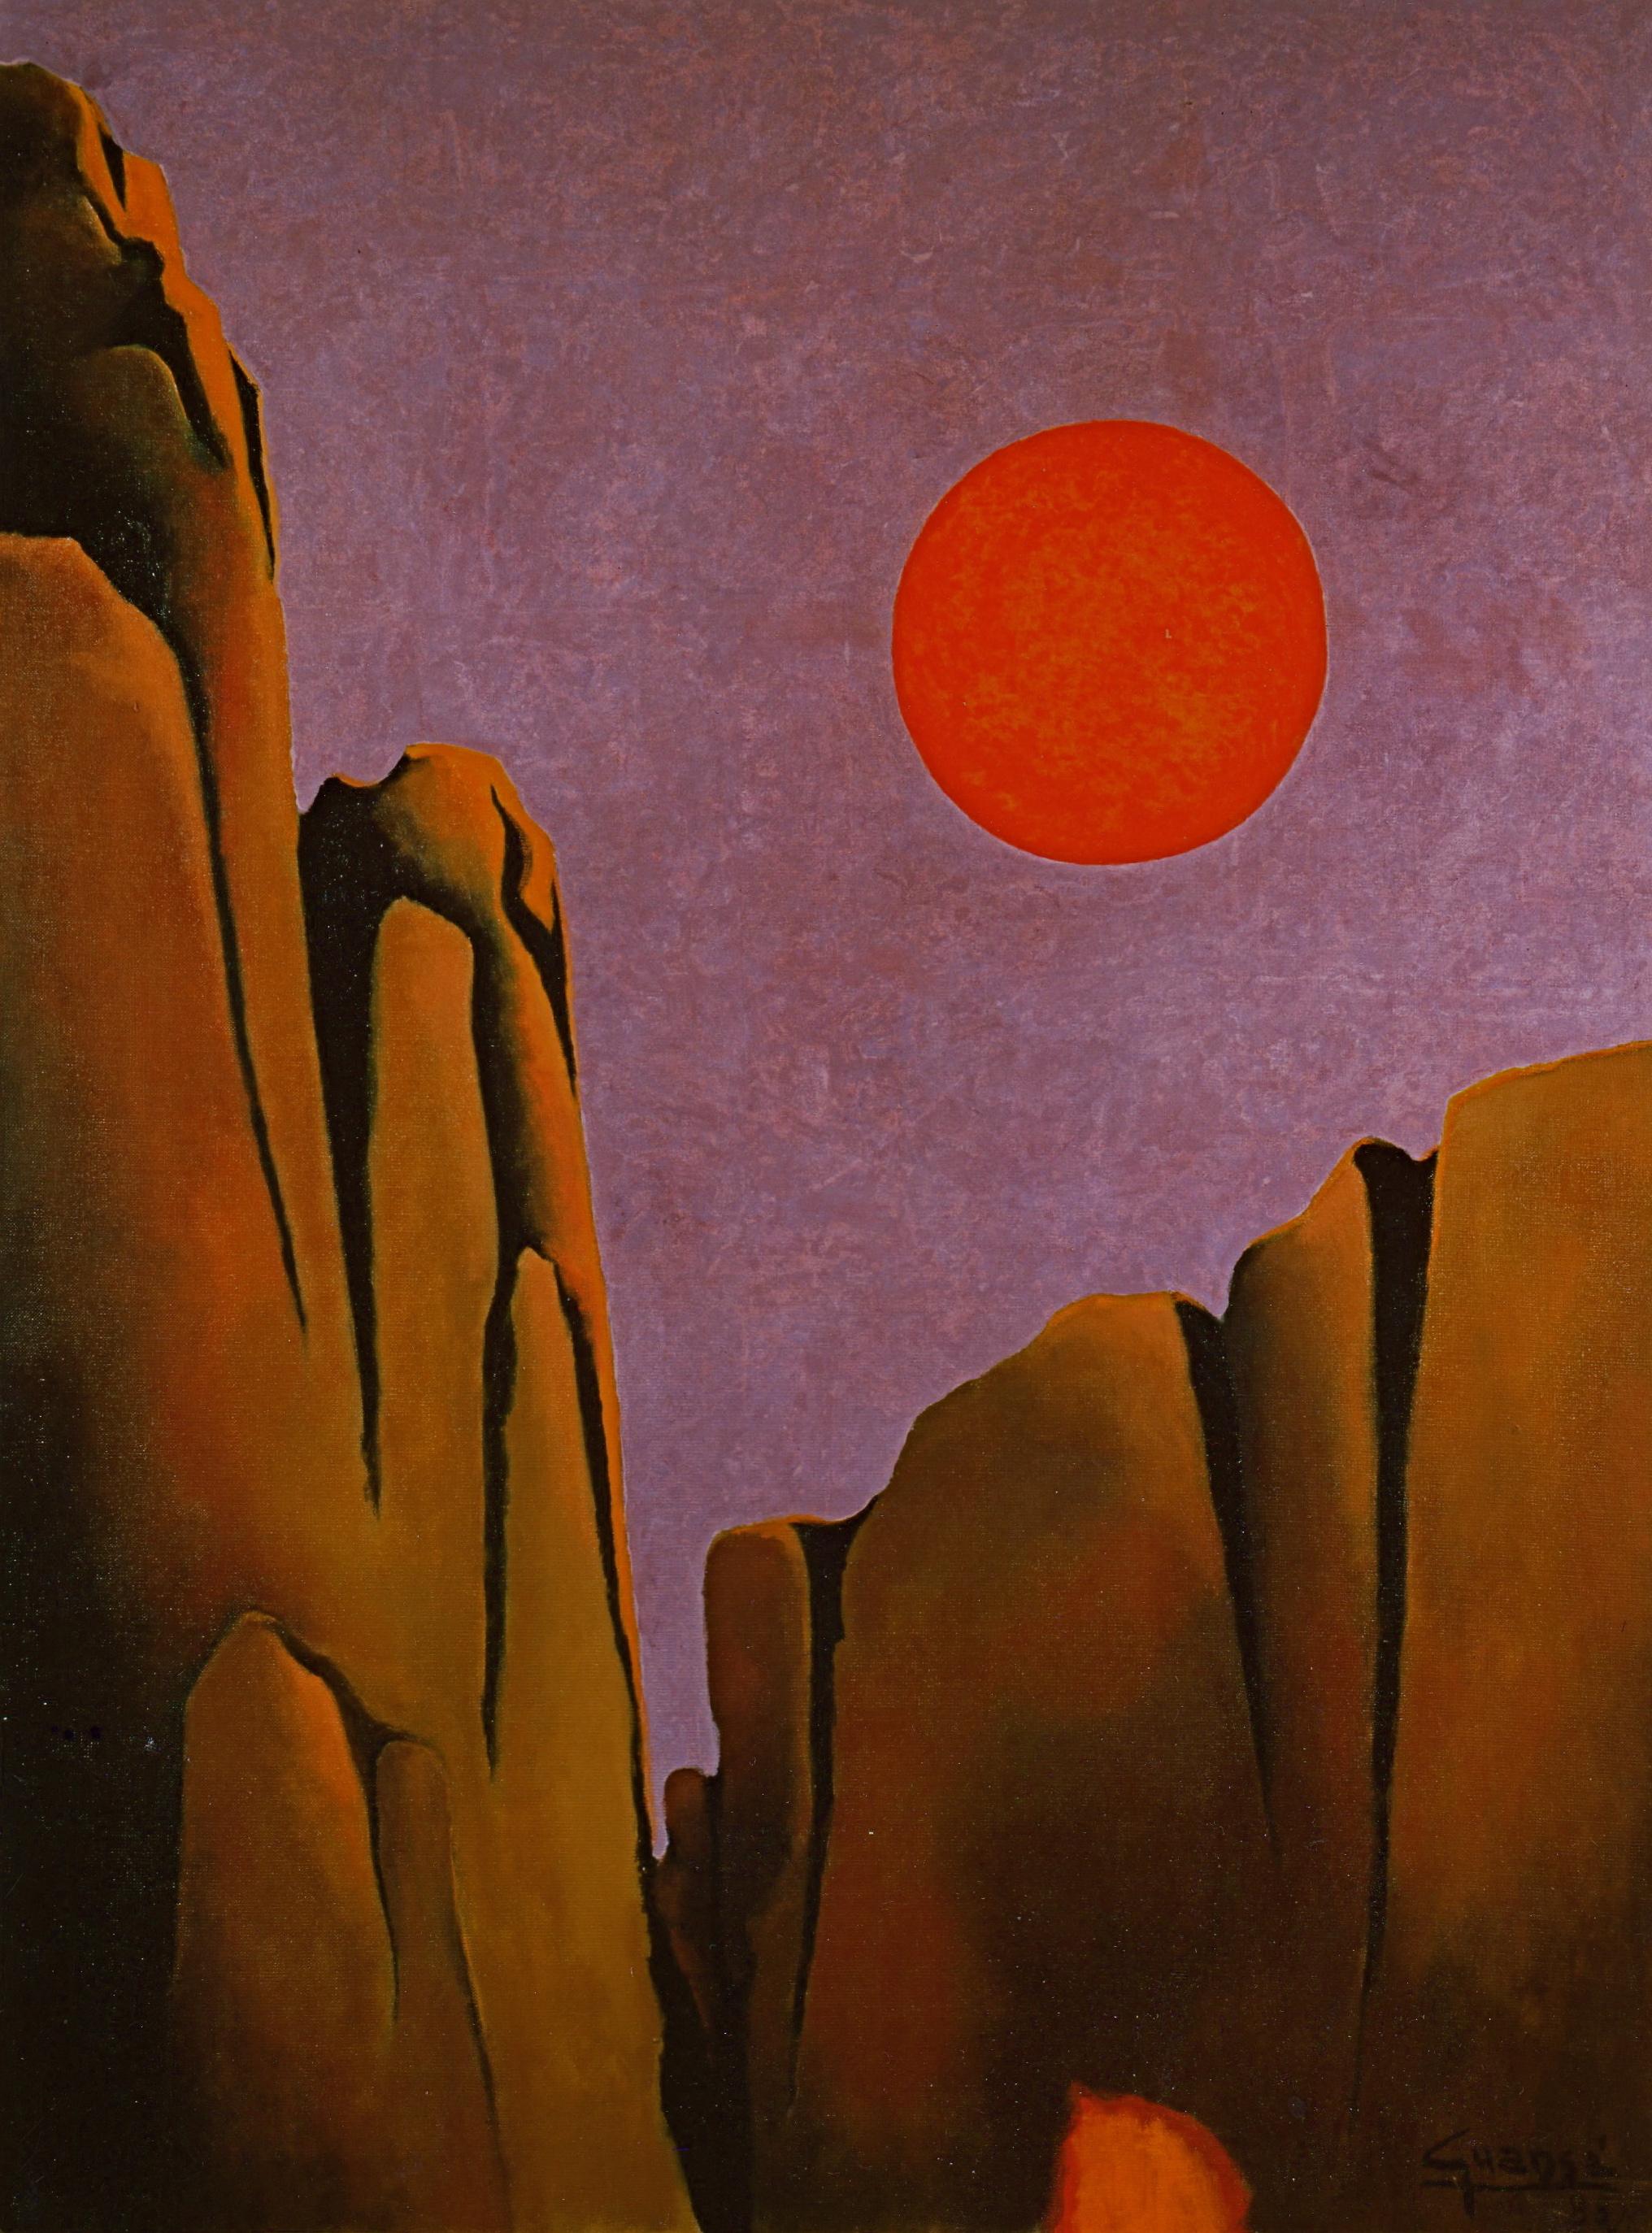 Gorge,1988